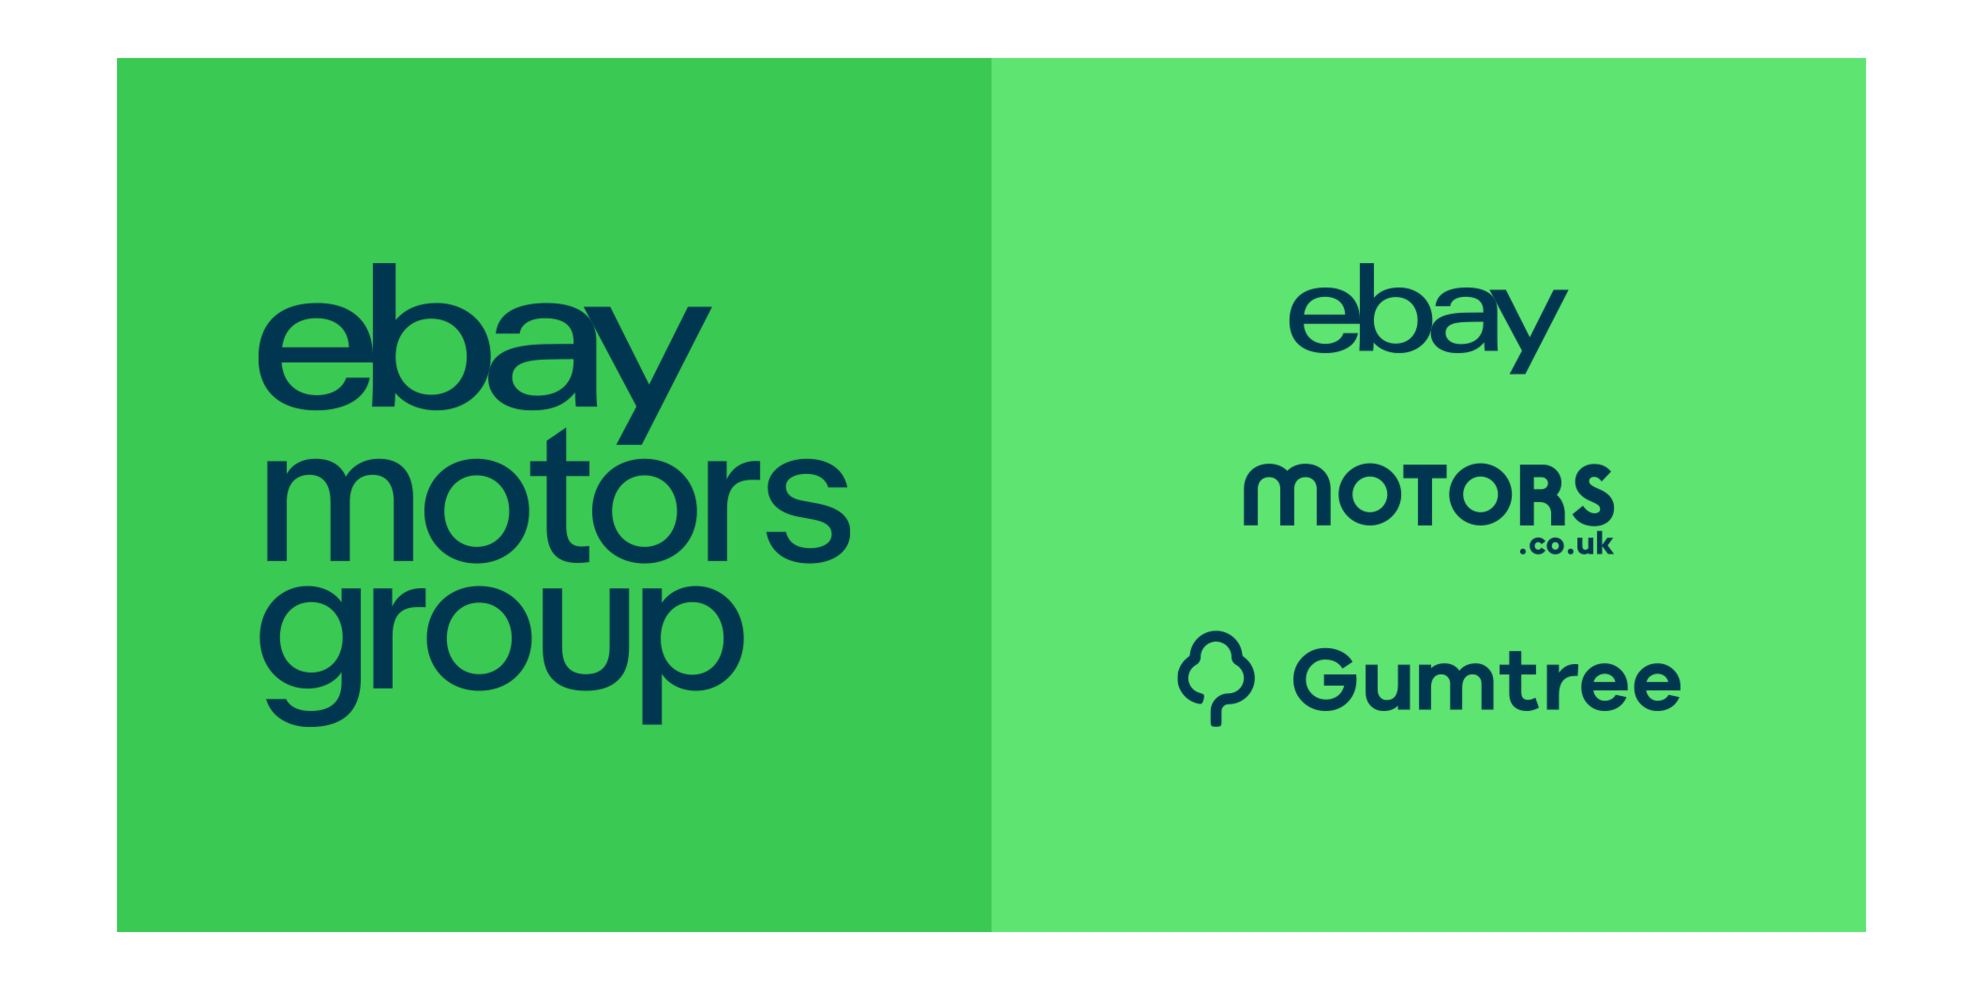 Ebay Motors Group